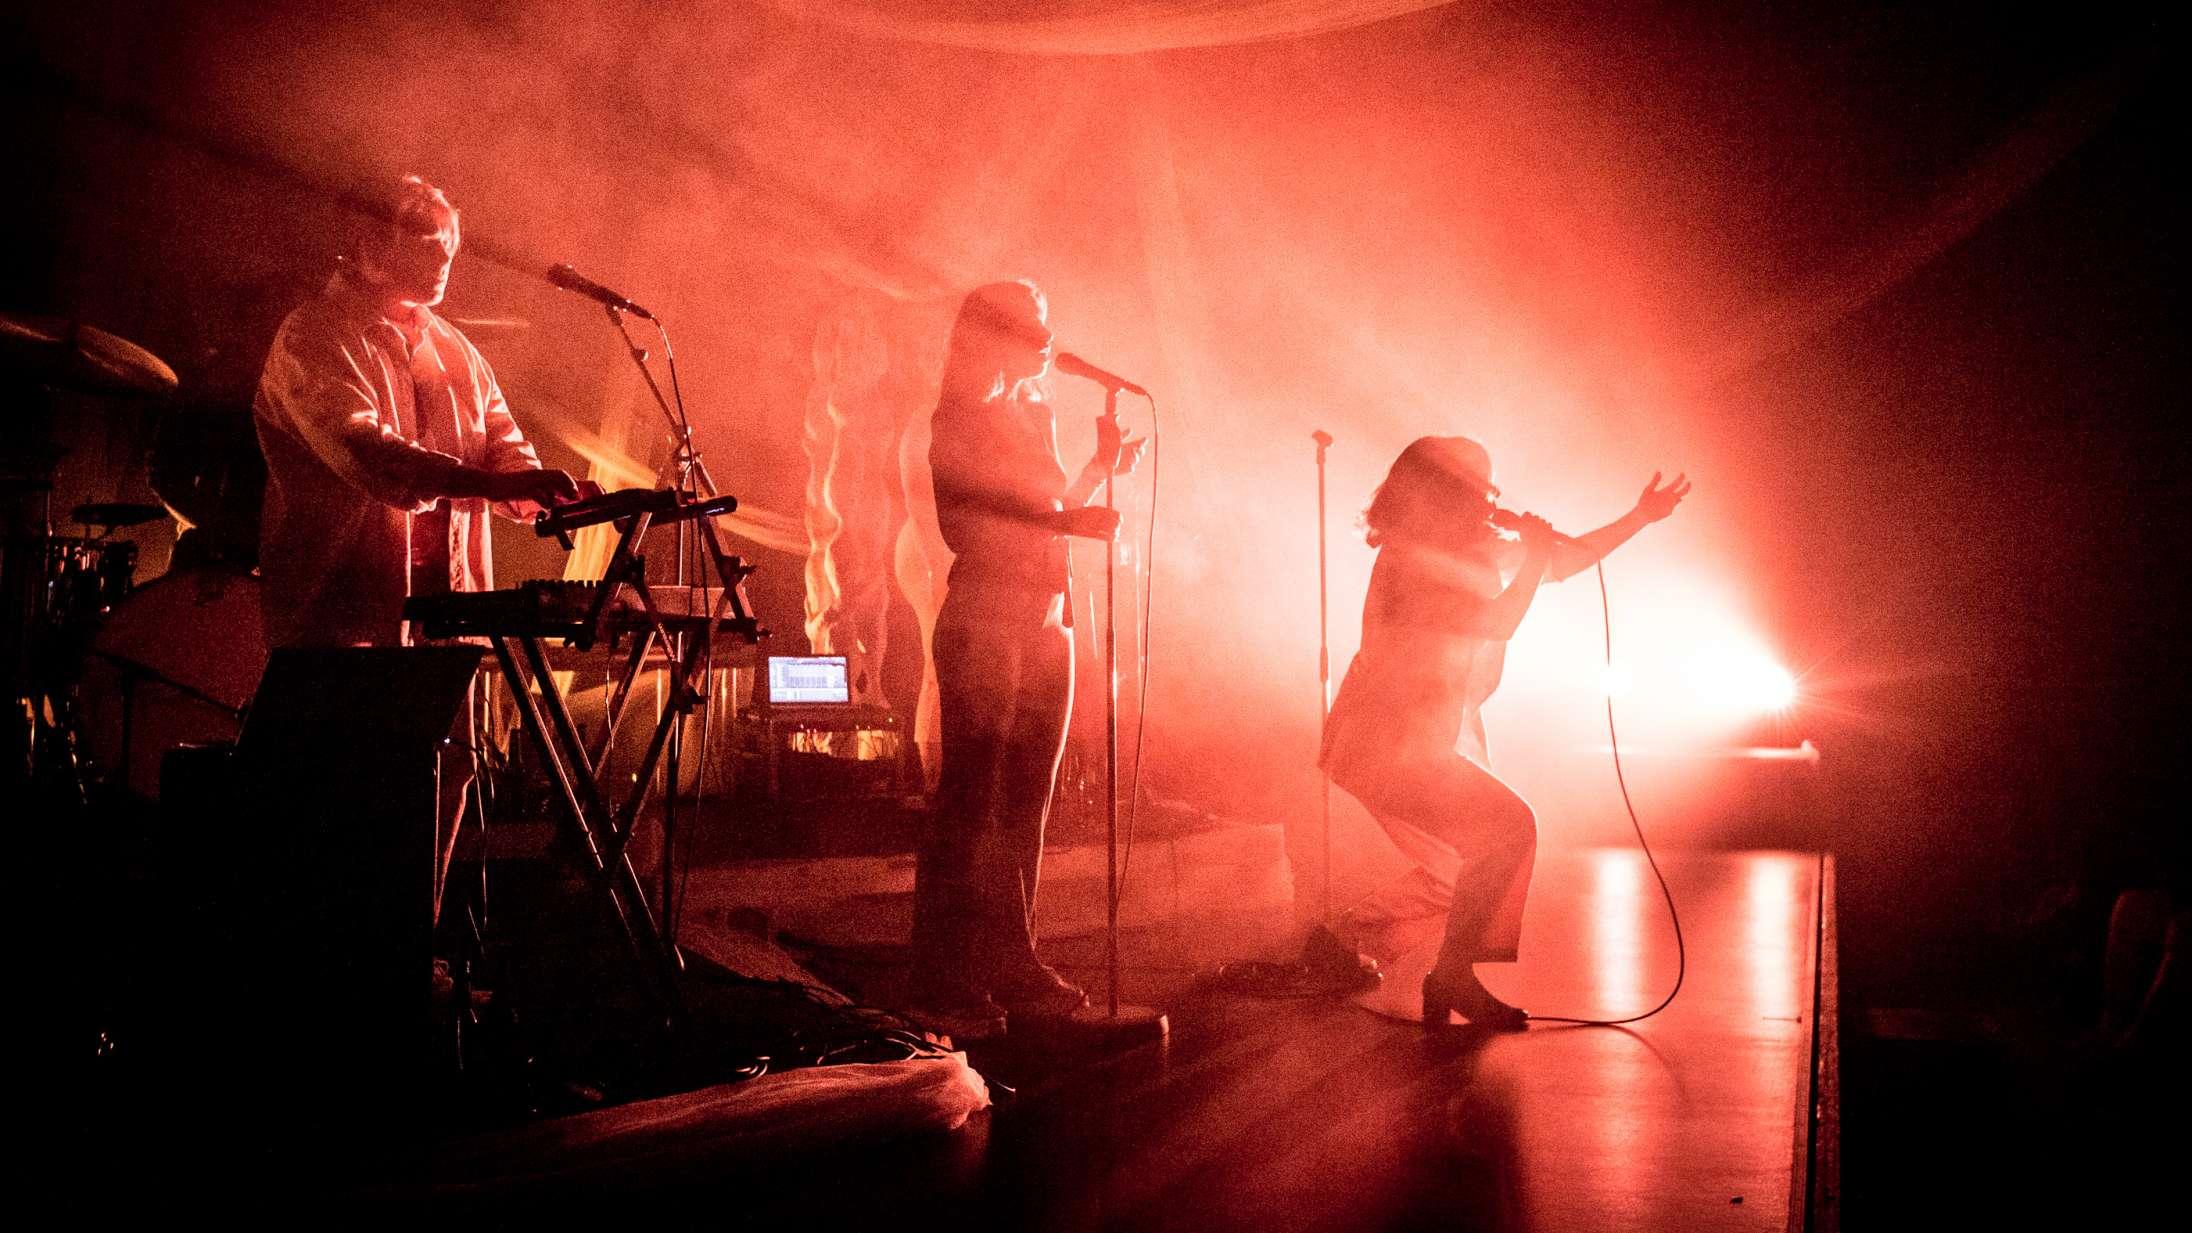 På Bremen Teater gav tre dragende sirener liv til Gangers hyldest til kvinden